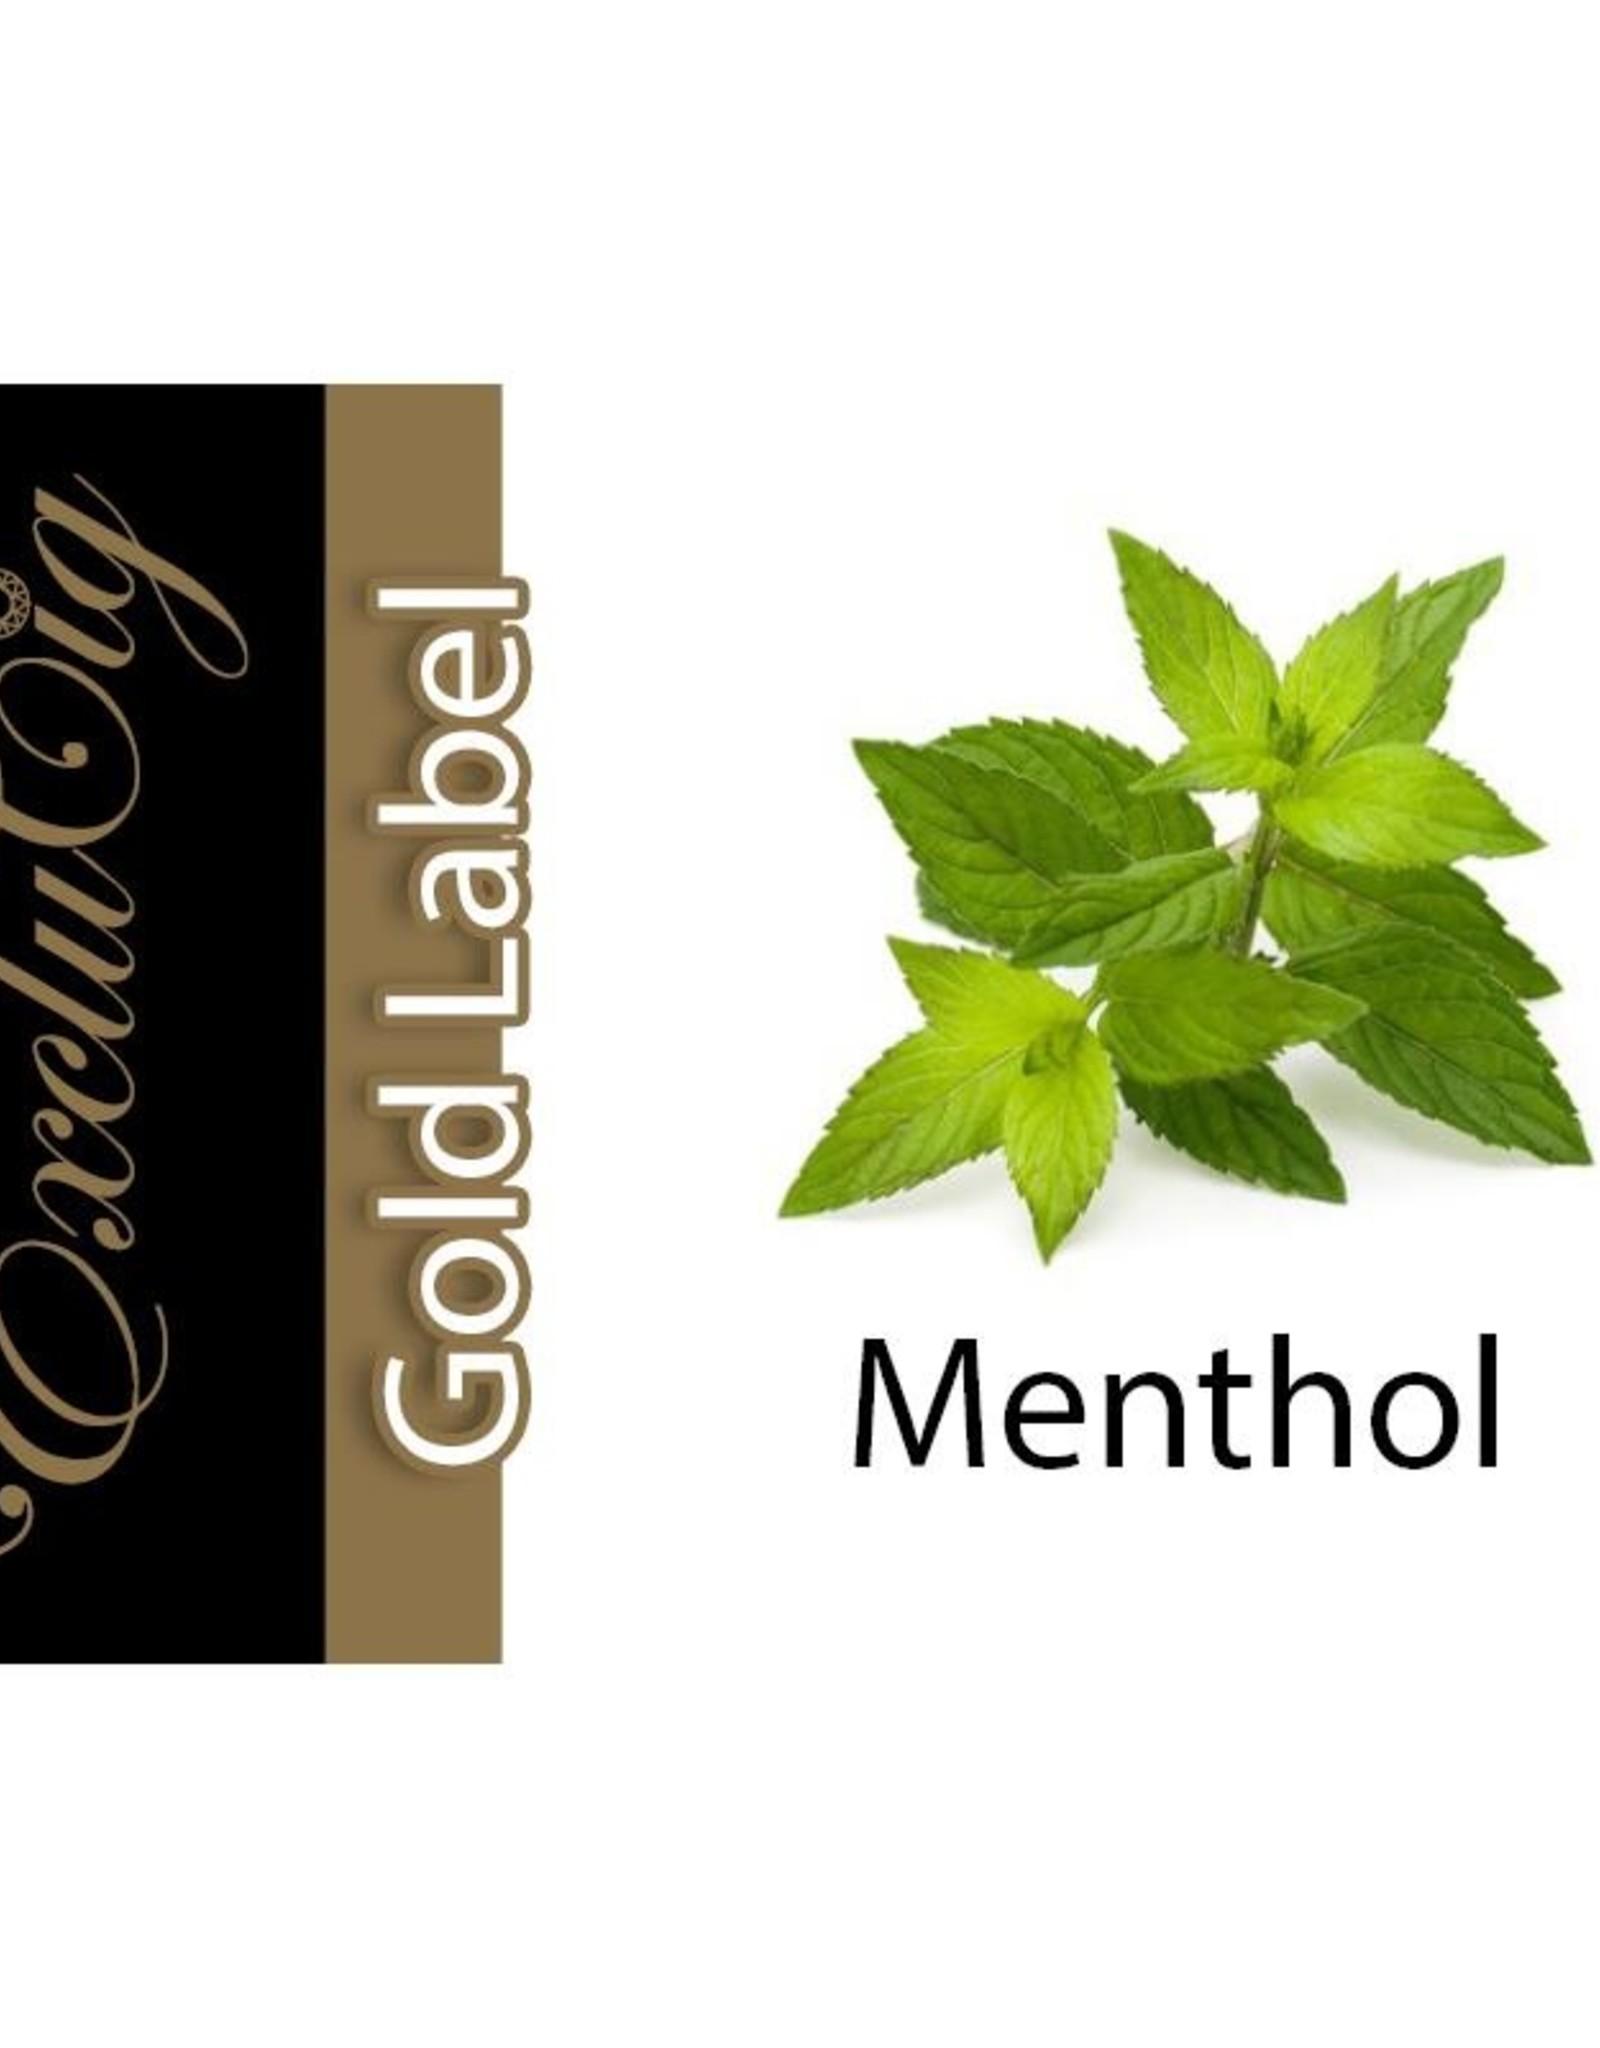 Exclucig Exclucig Gold Label E-liquid Menthol 0 mg Nicotine